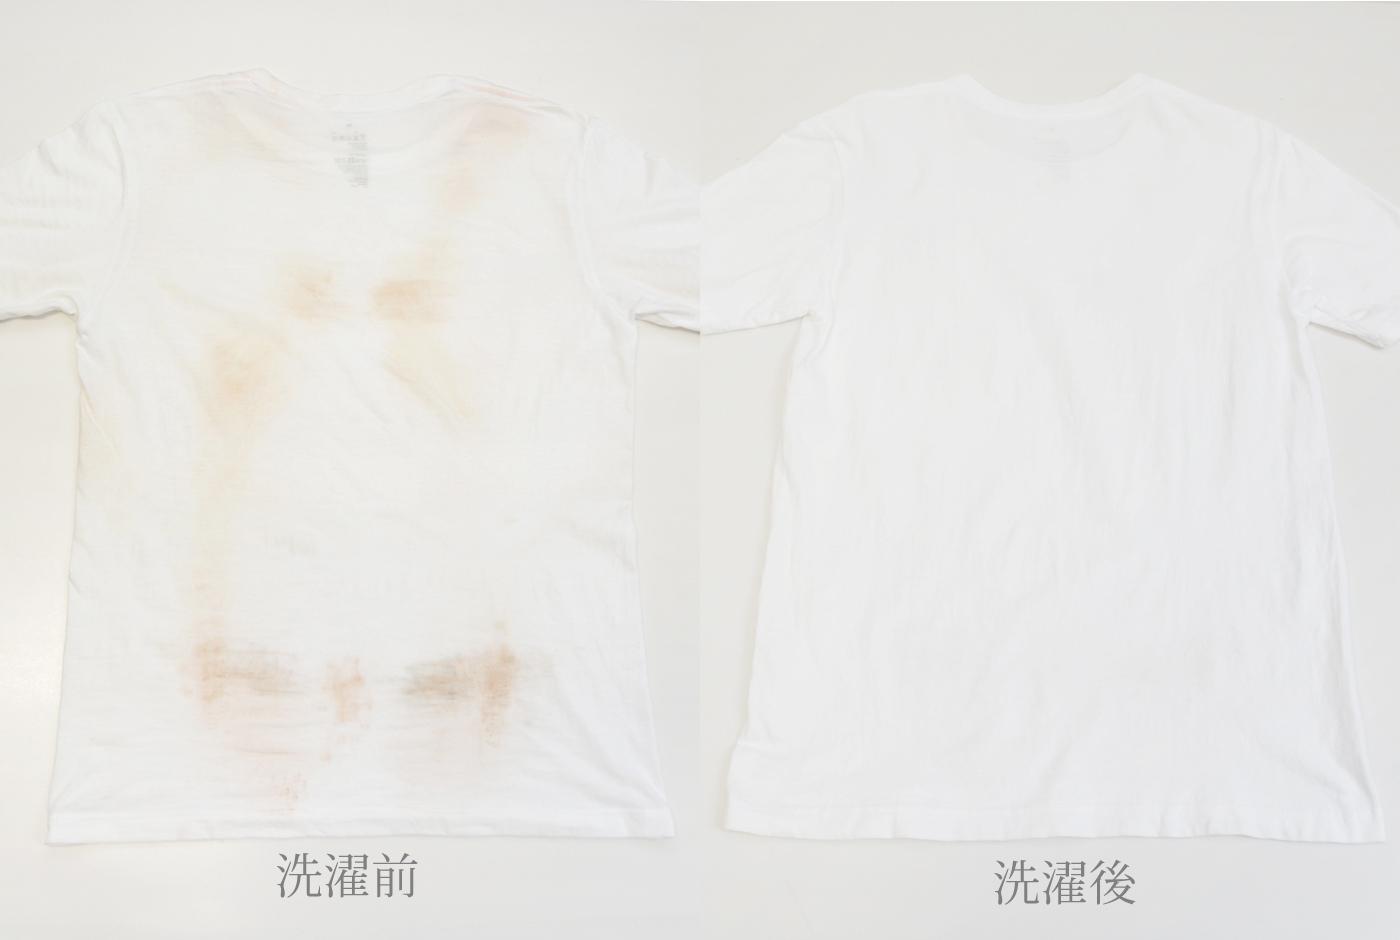 HERZなんでも実験室 Vol.2 番外編 白T 洗濯